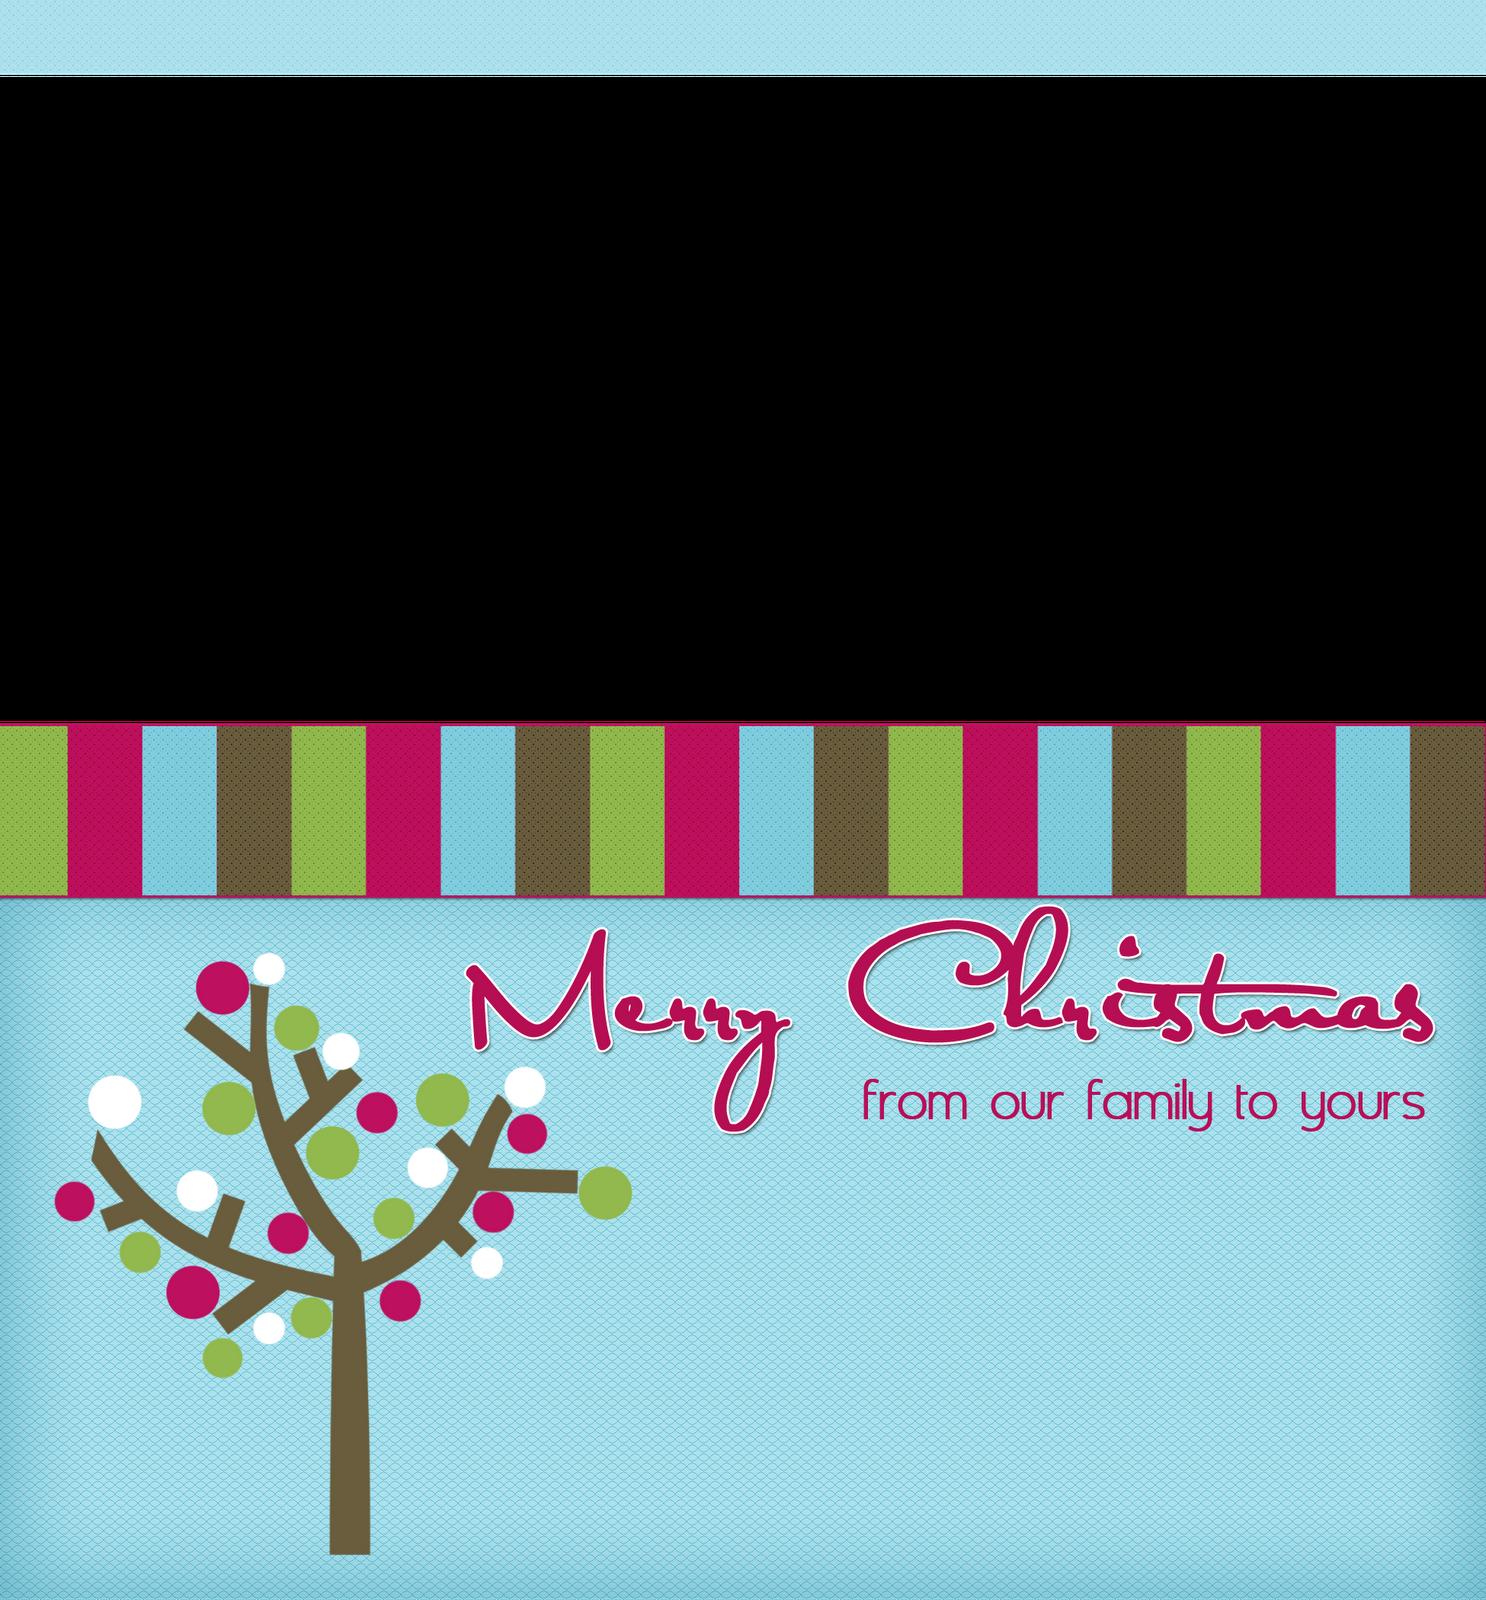 Pin By Stephanie Gubics On Christmas Card Templates Pinterest